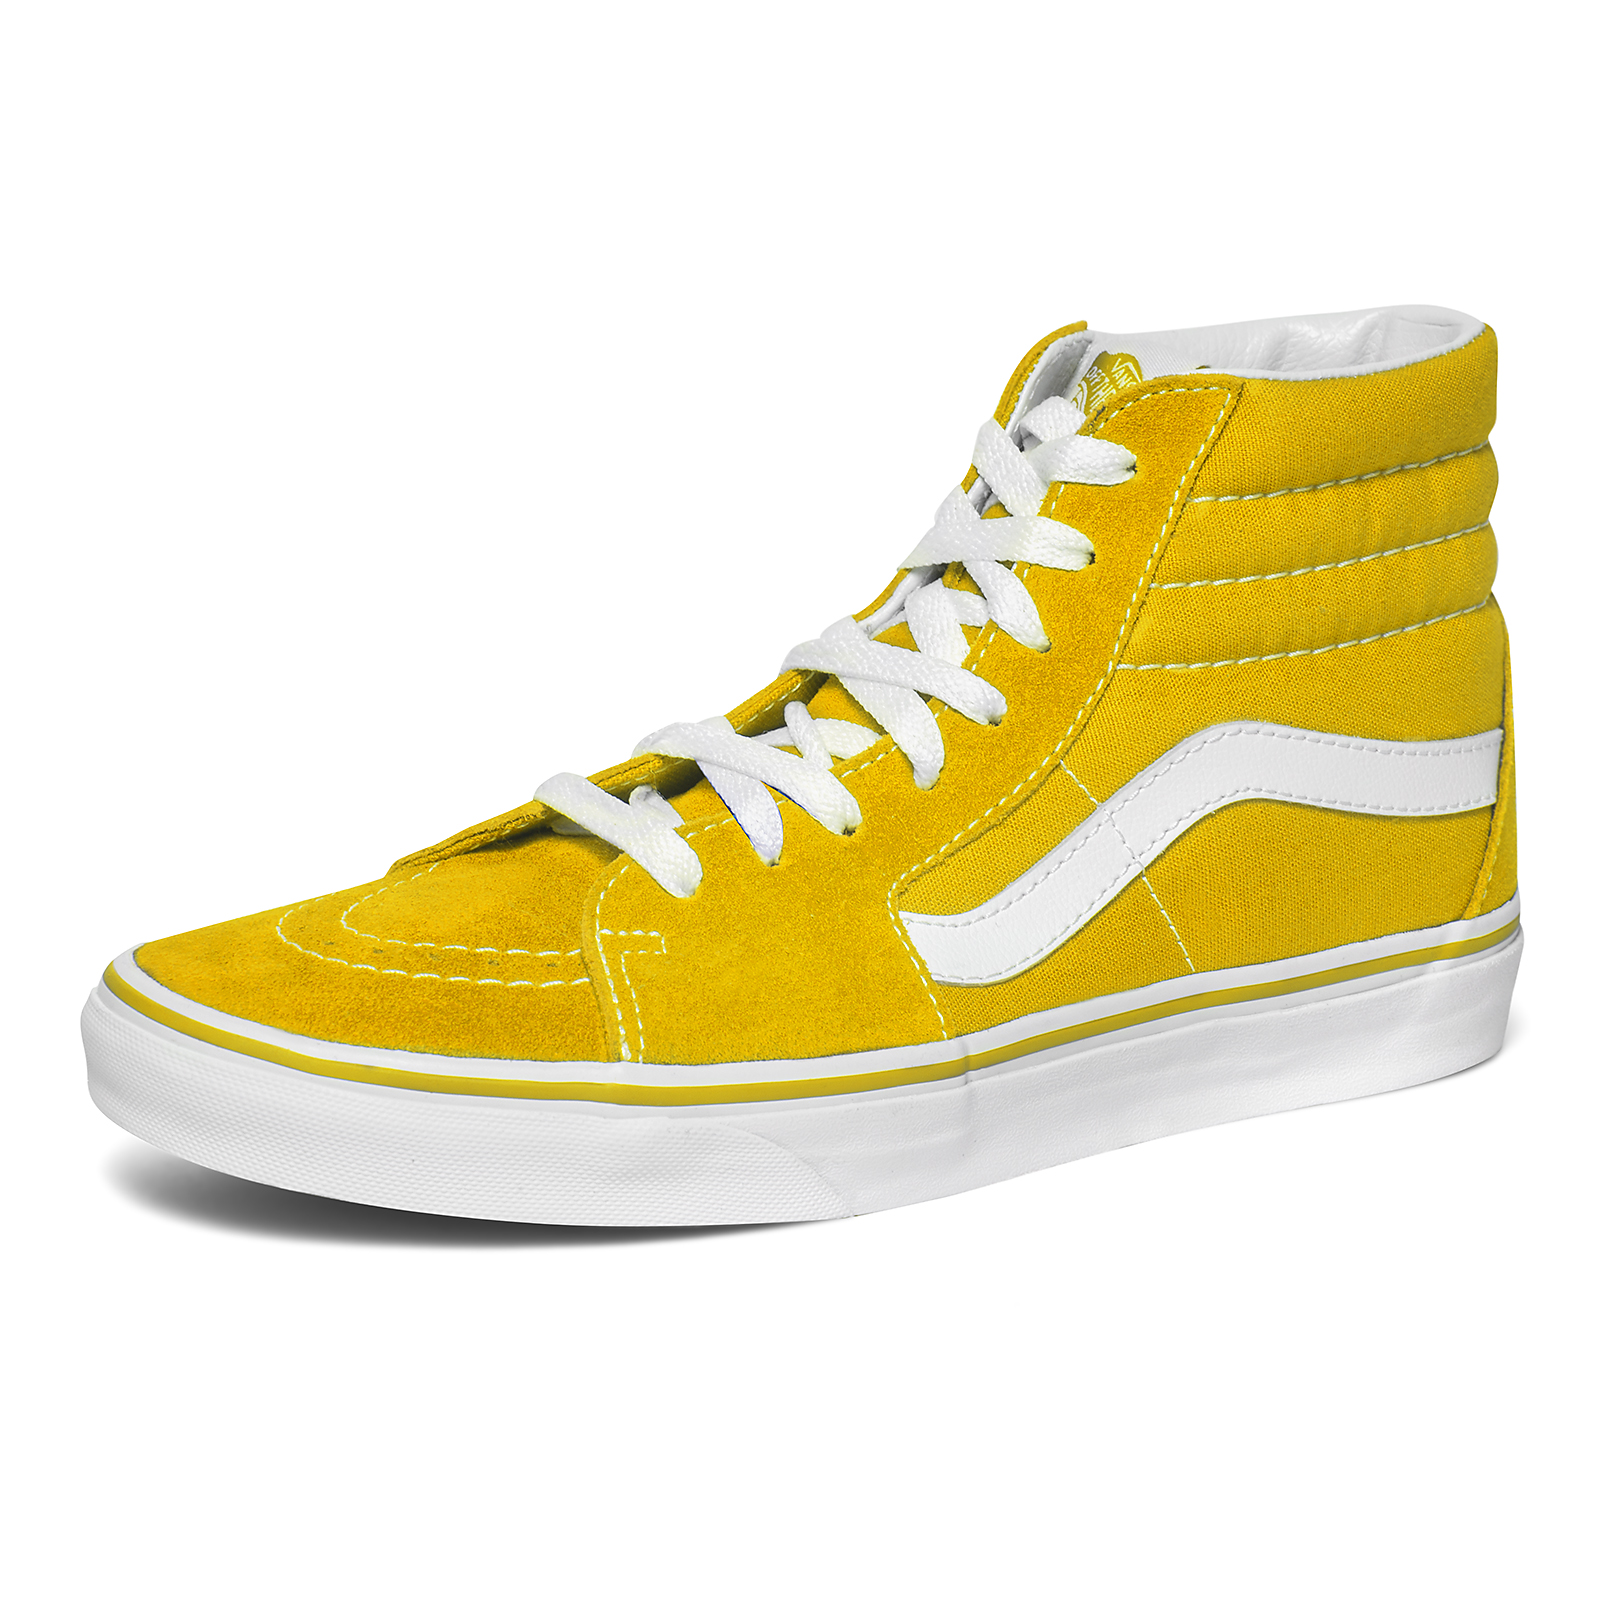 Vans scarpe Ua Sk8-Hi Suede Canvas Spectra Yellow / True White